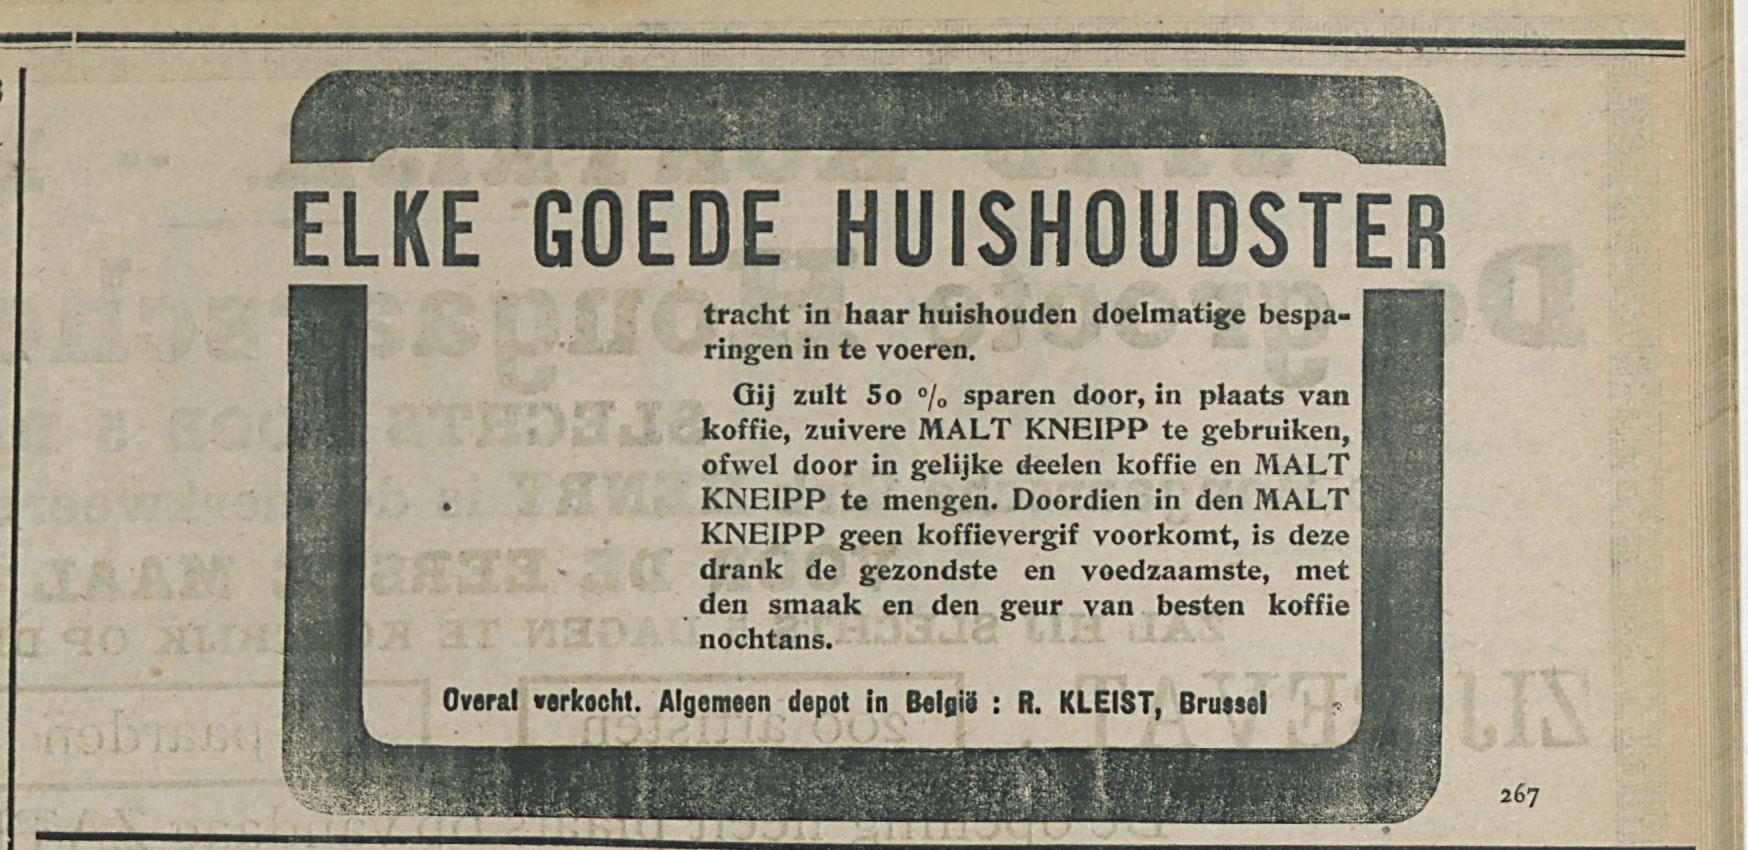 ELKE GOEDE HUISHOUDSTER